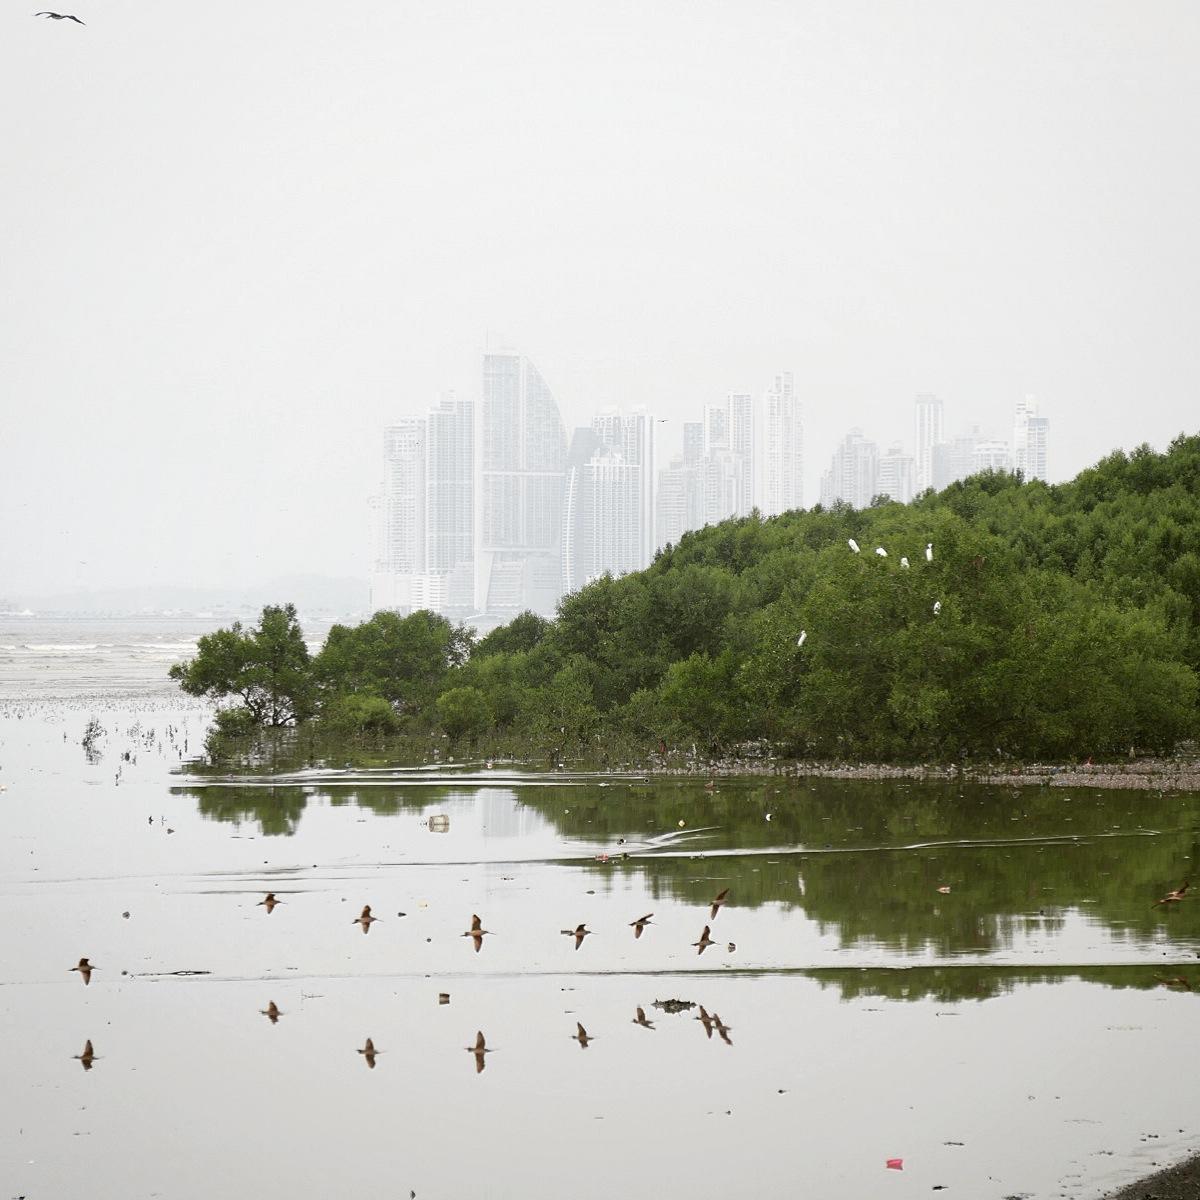 The shorebird flats at Panama Bay are backdropped by the skyscrapers of downtown Panama City. Noah Strycker